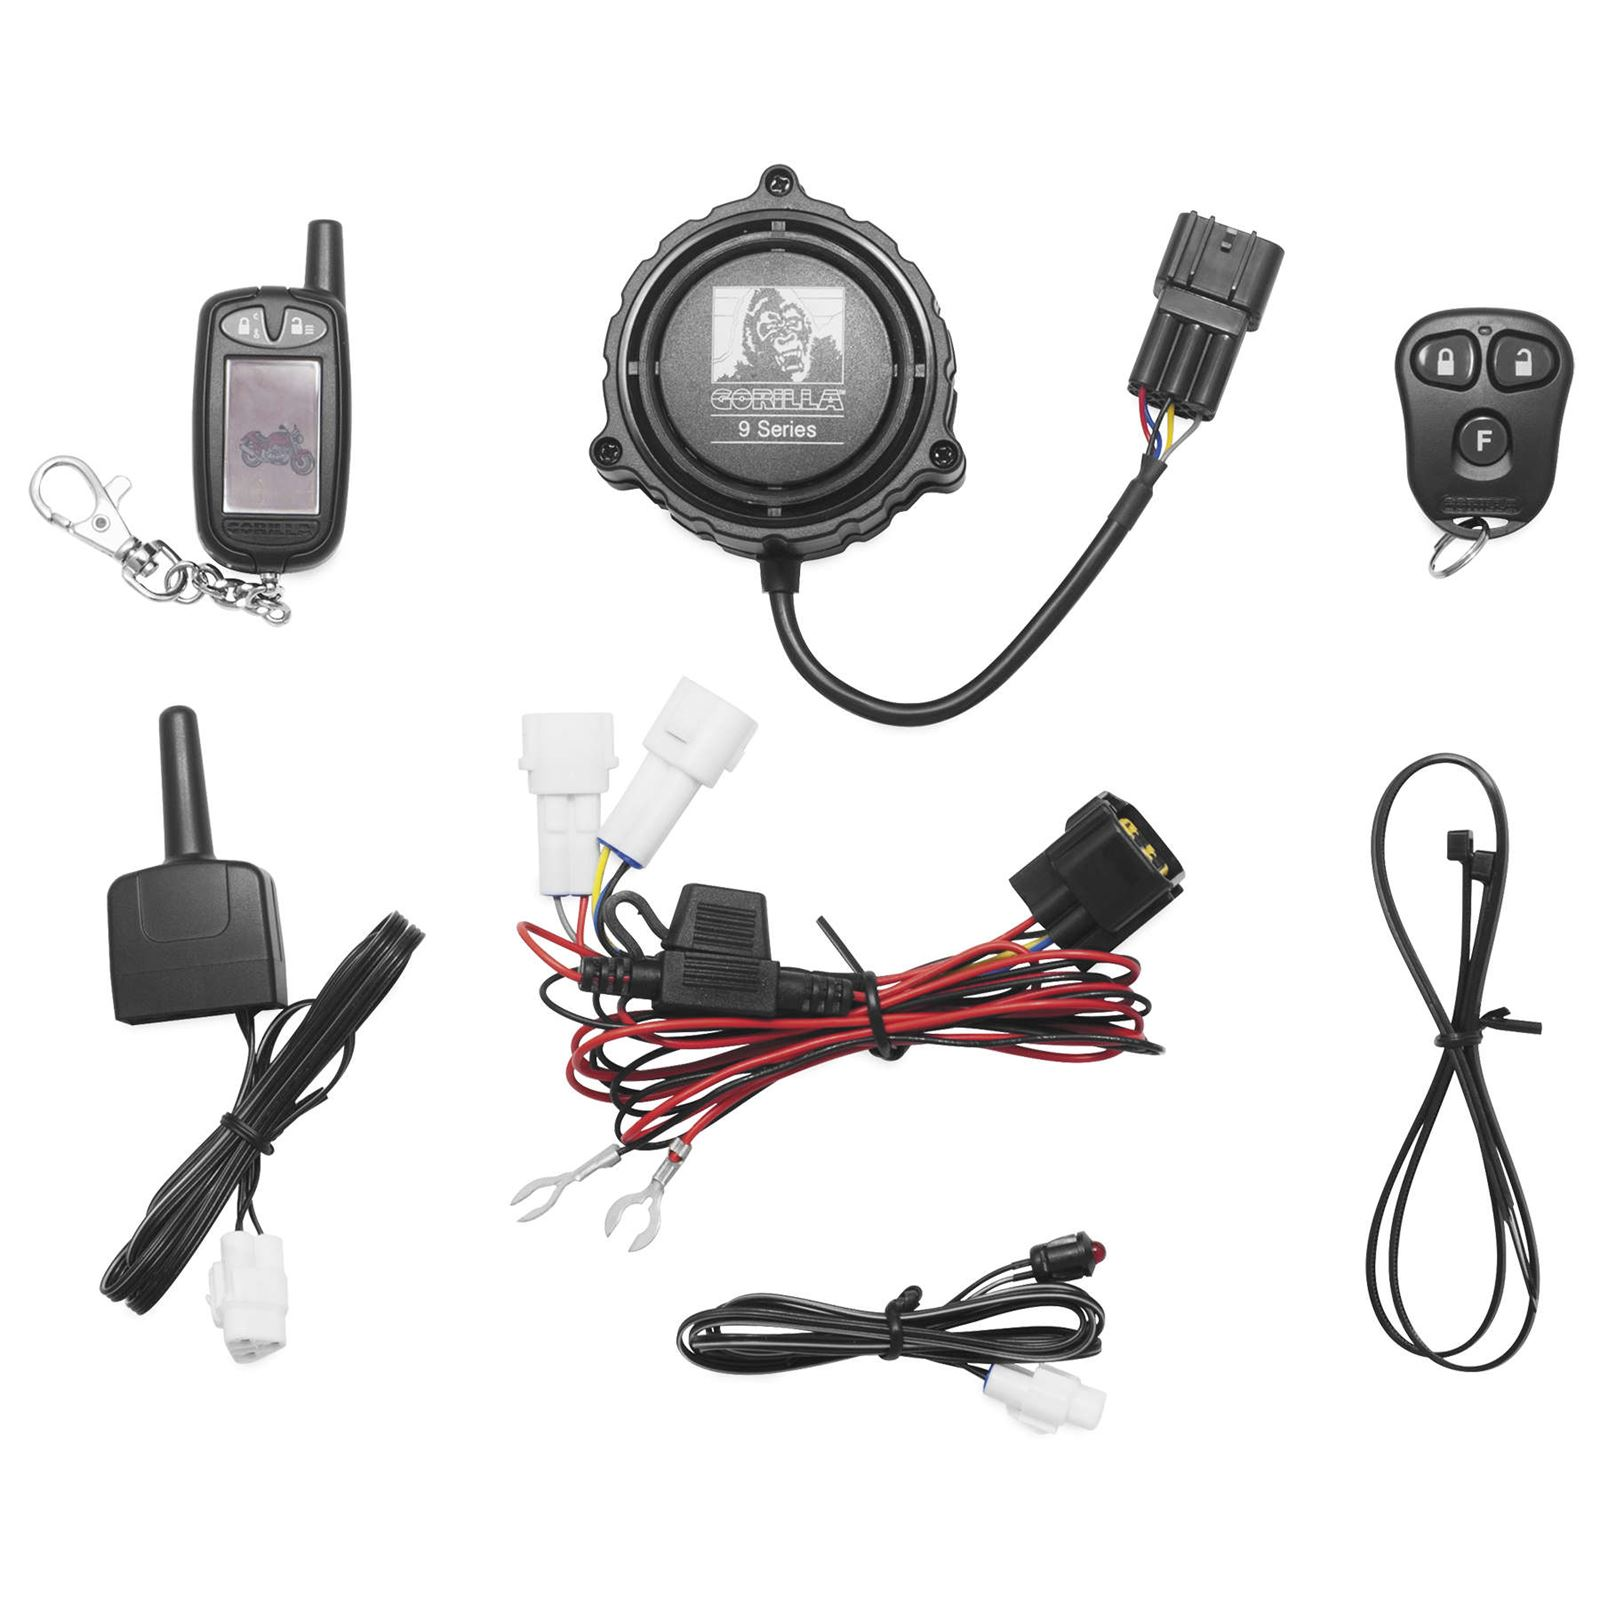 Gorilla 9100 Cycle Alarm w/2-Way Paging System